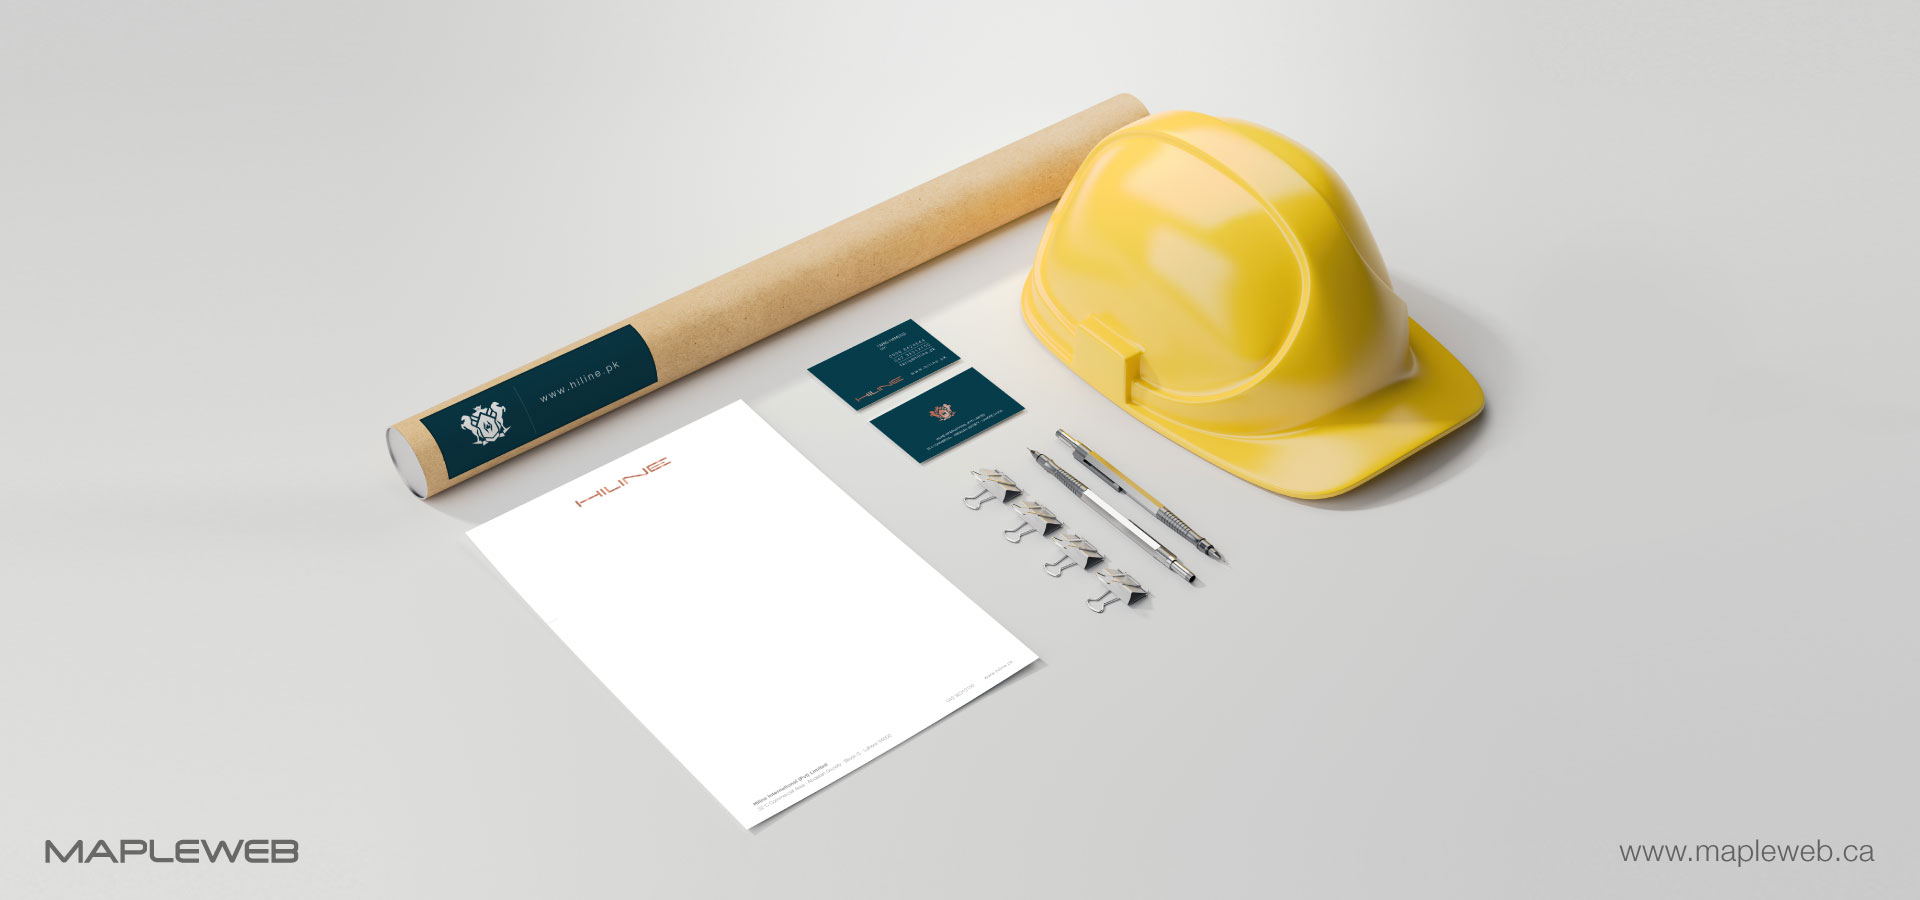 hiline-brand-logo-design-by-mapleweb-vancouver-canada-stationery-mock